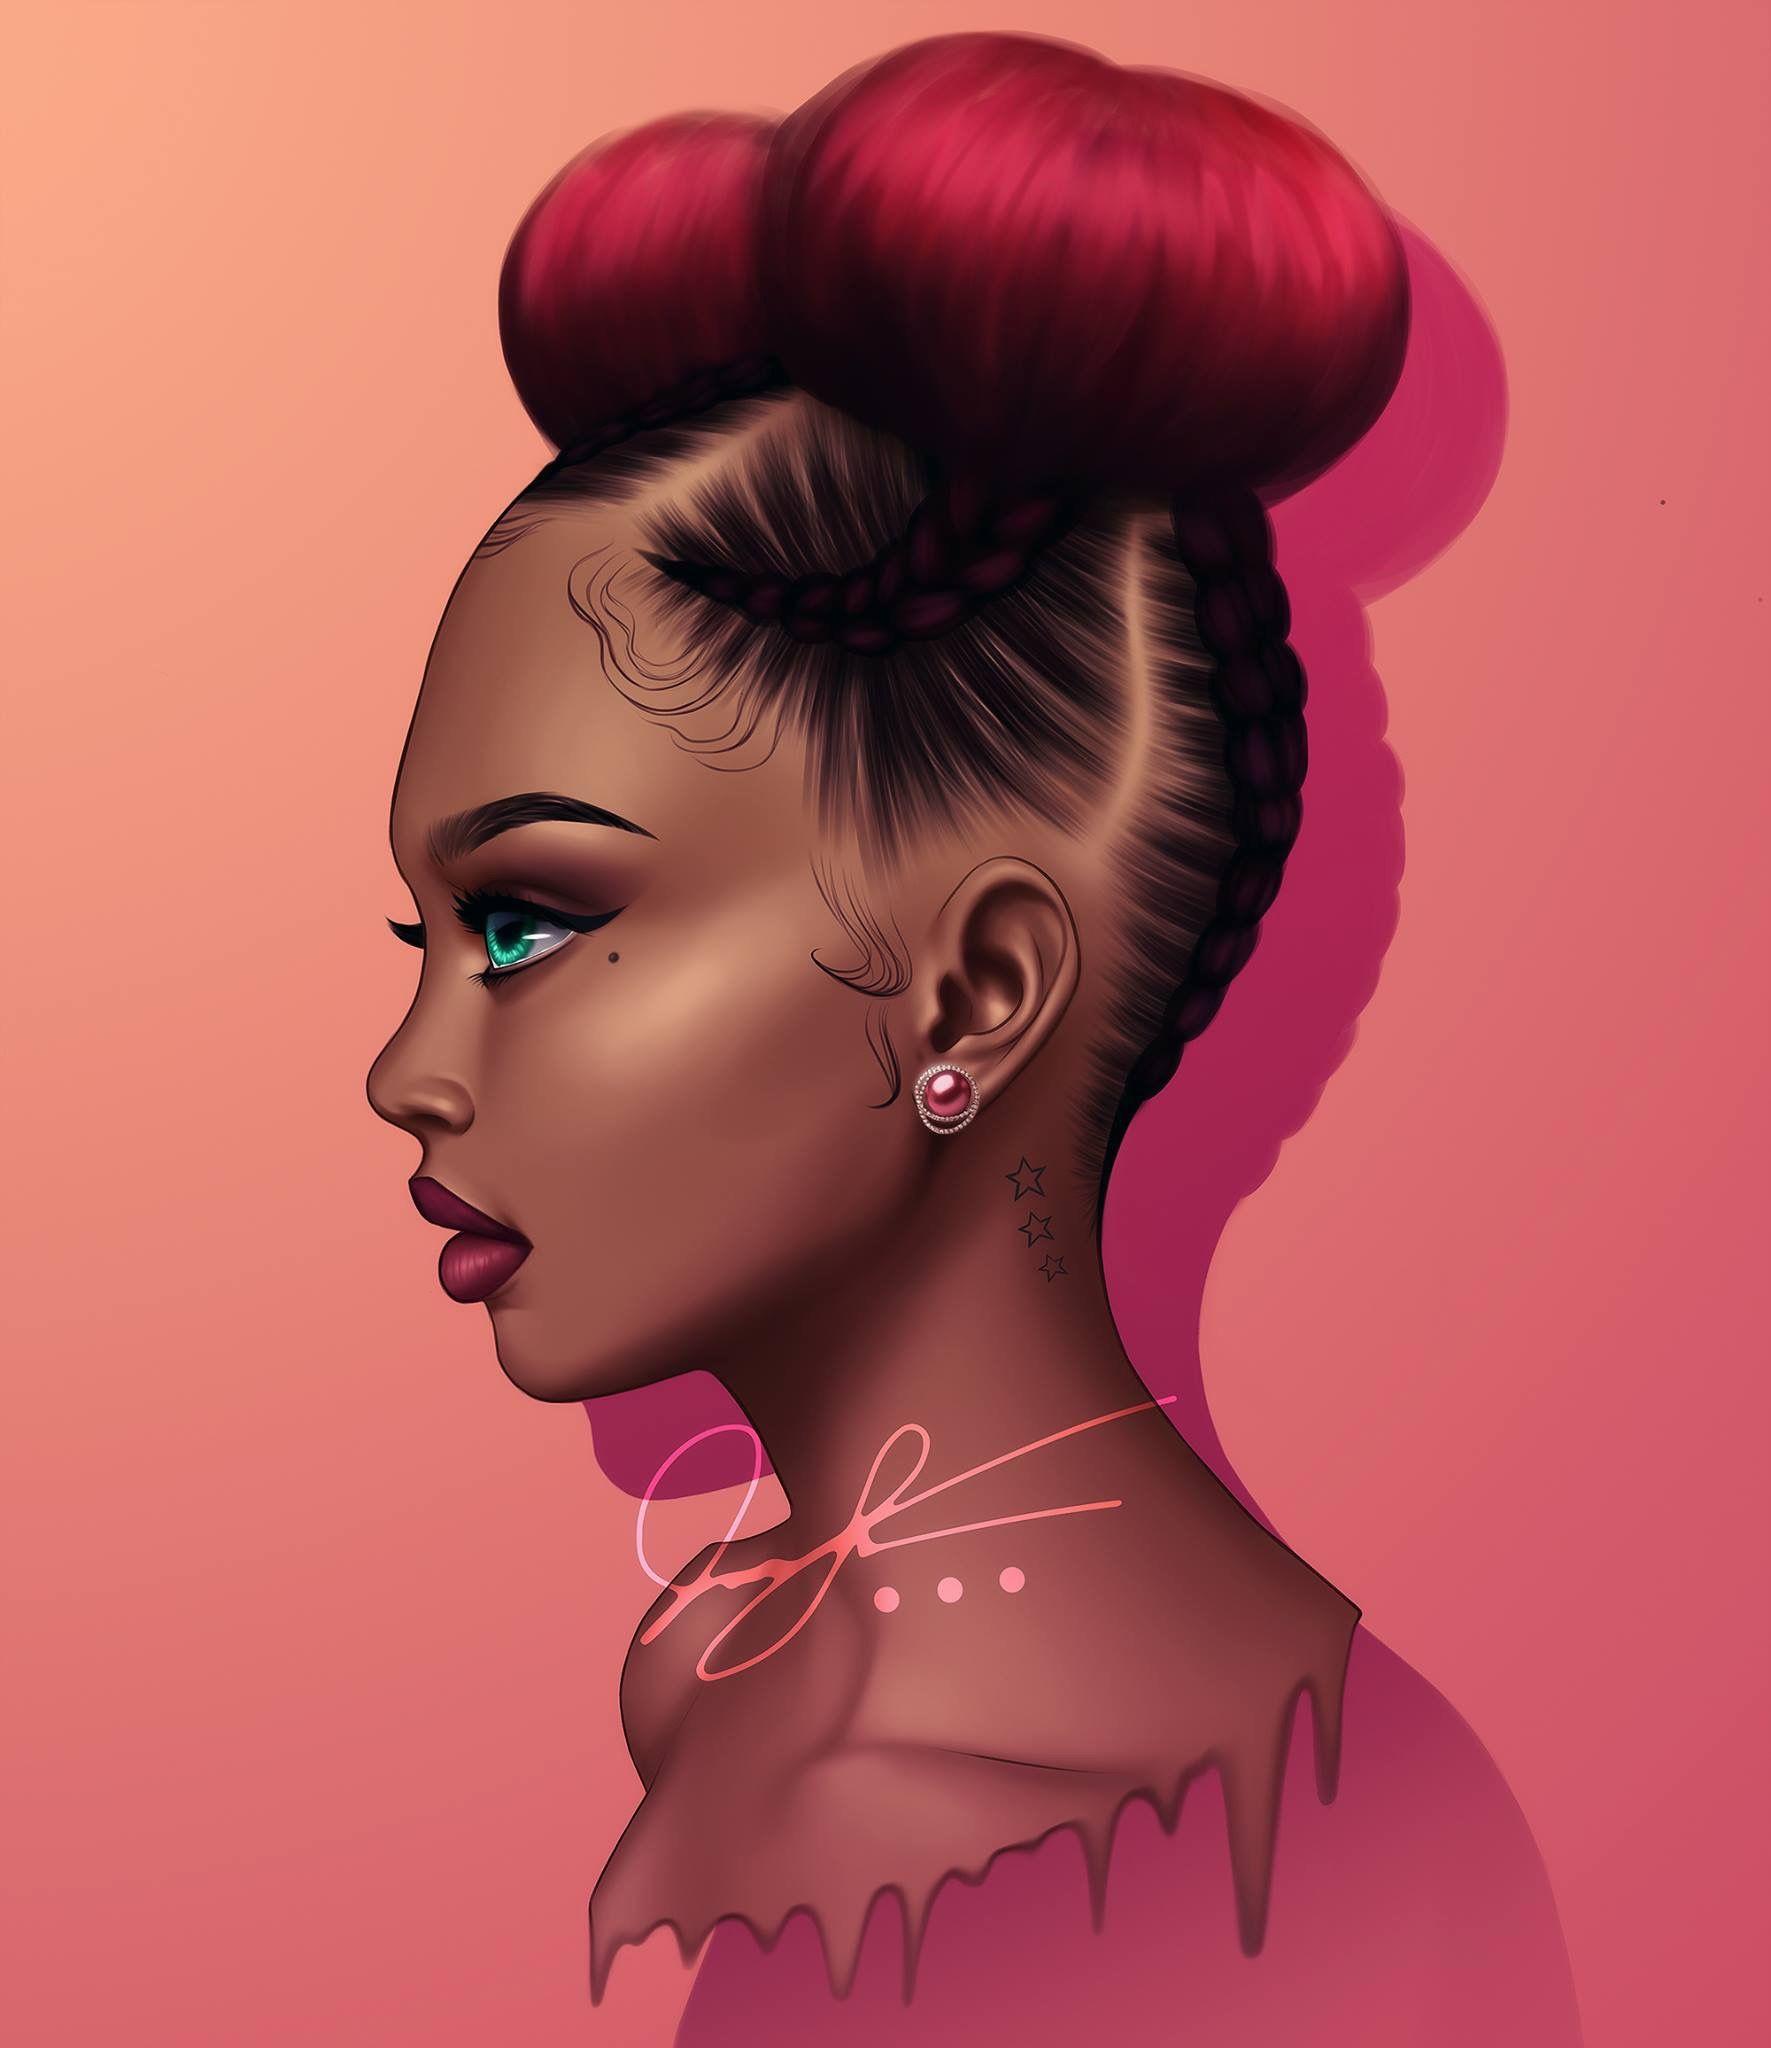 Myianayamyia Art Art Afro Américain Dessin De Fille Et